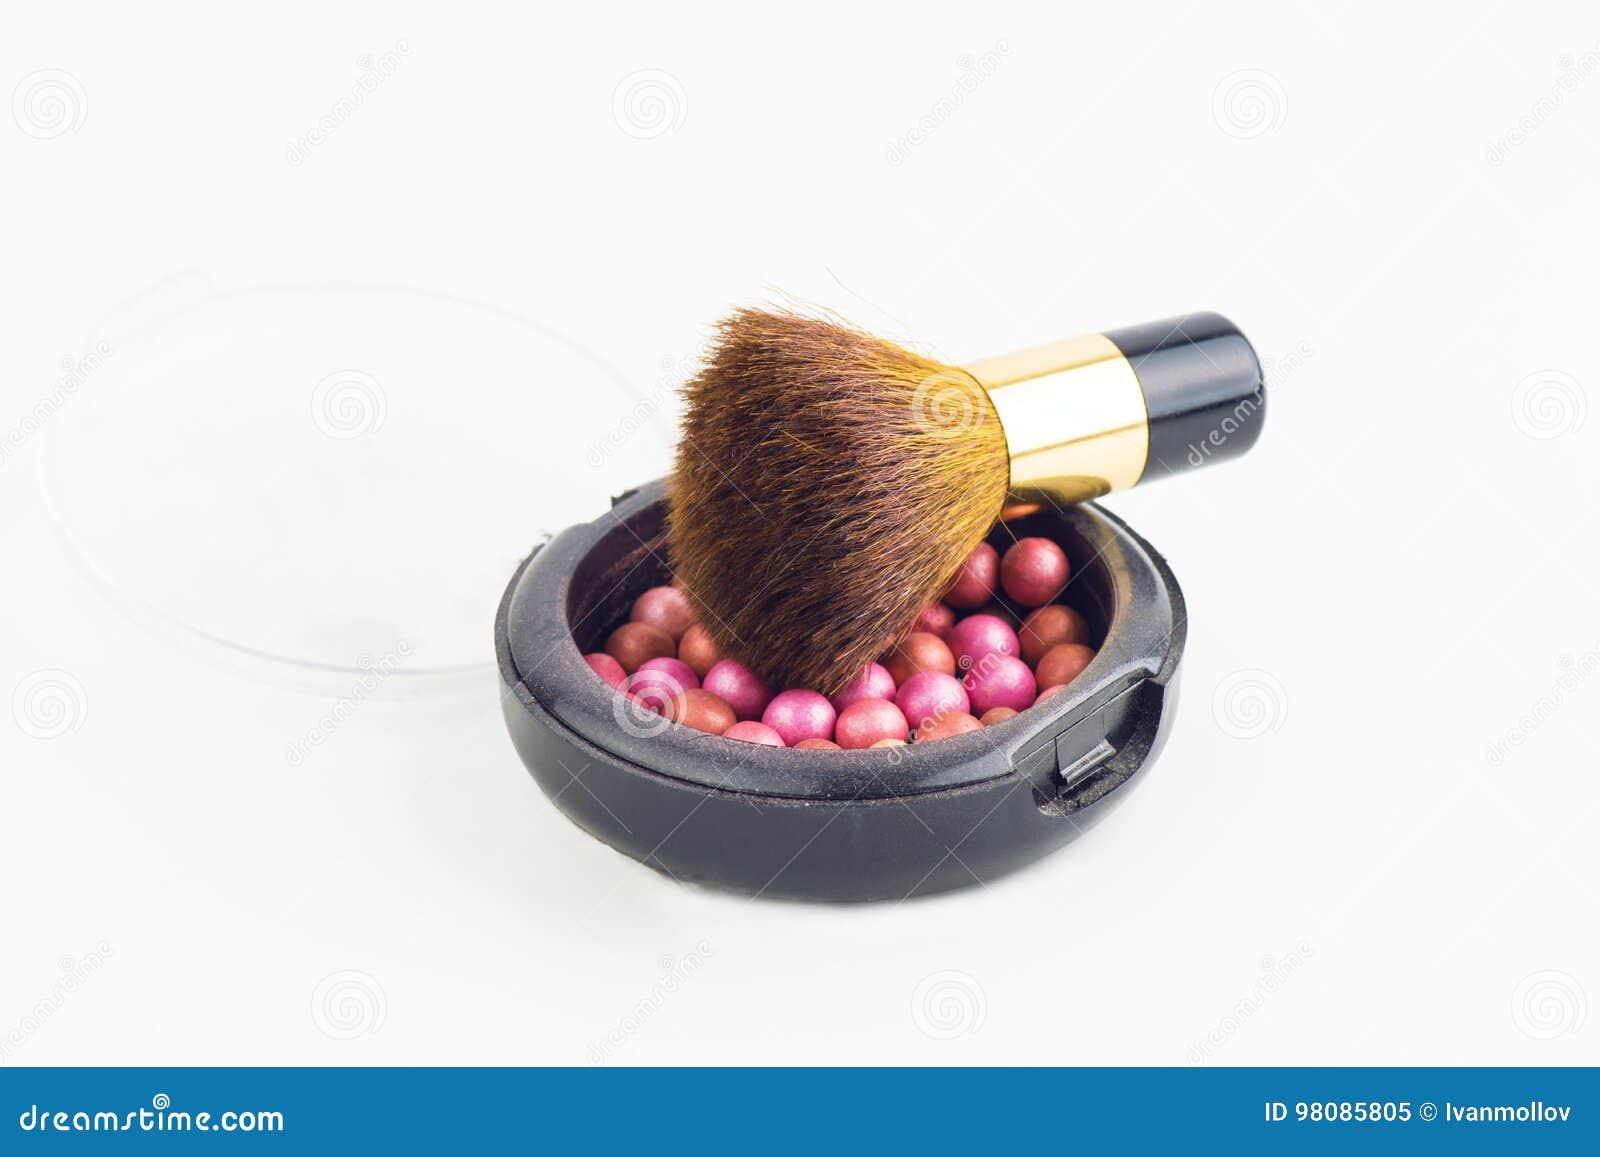 bronzing pearls box and makeup brush stock image image of blush